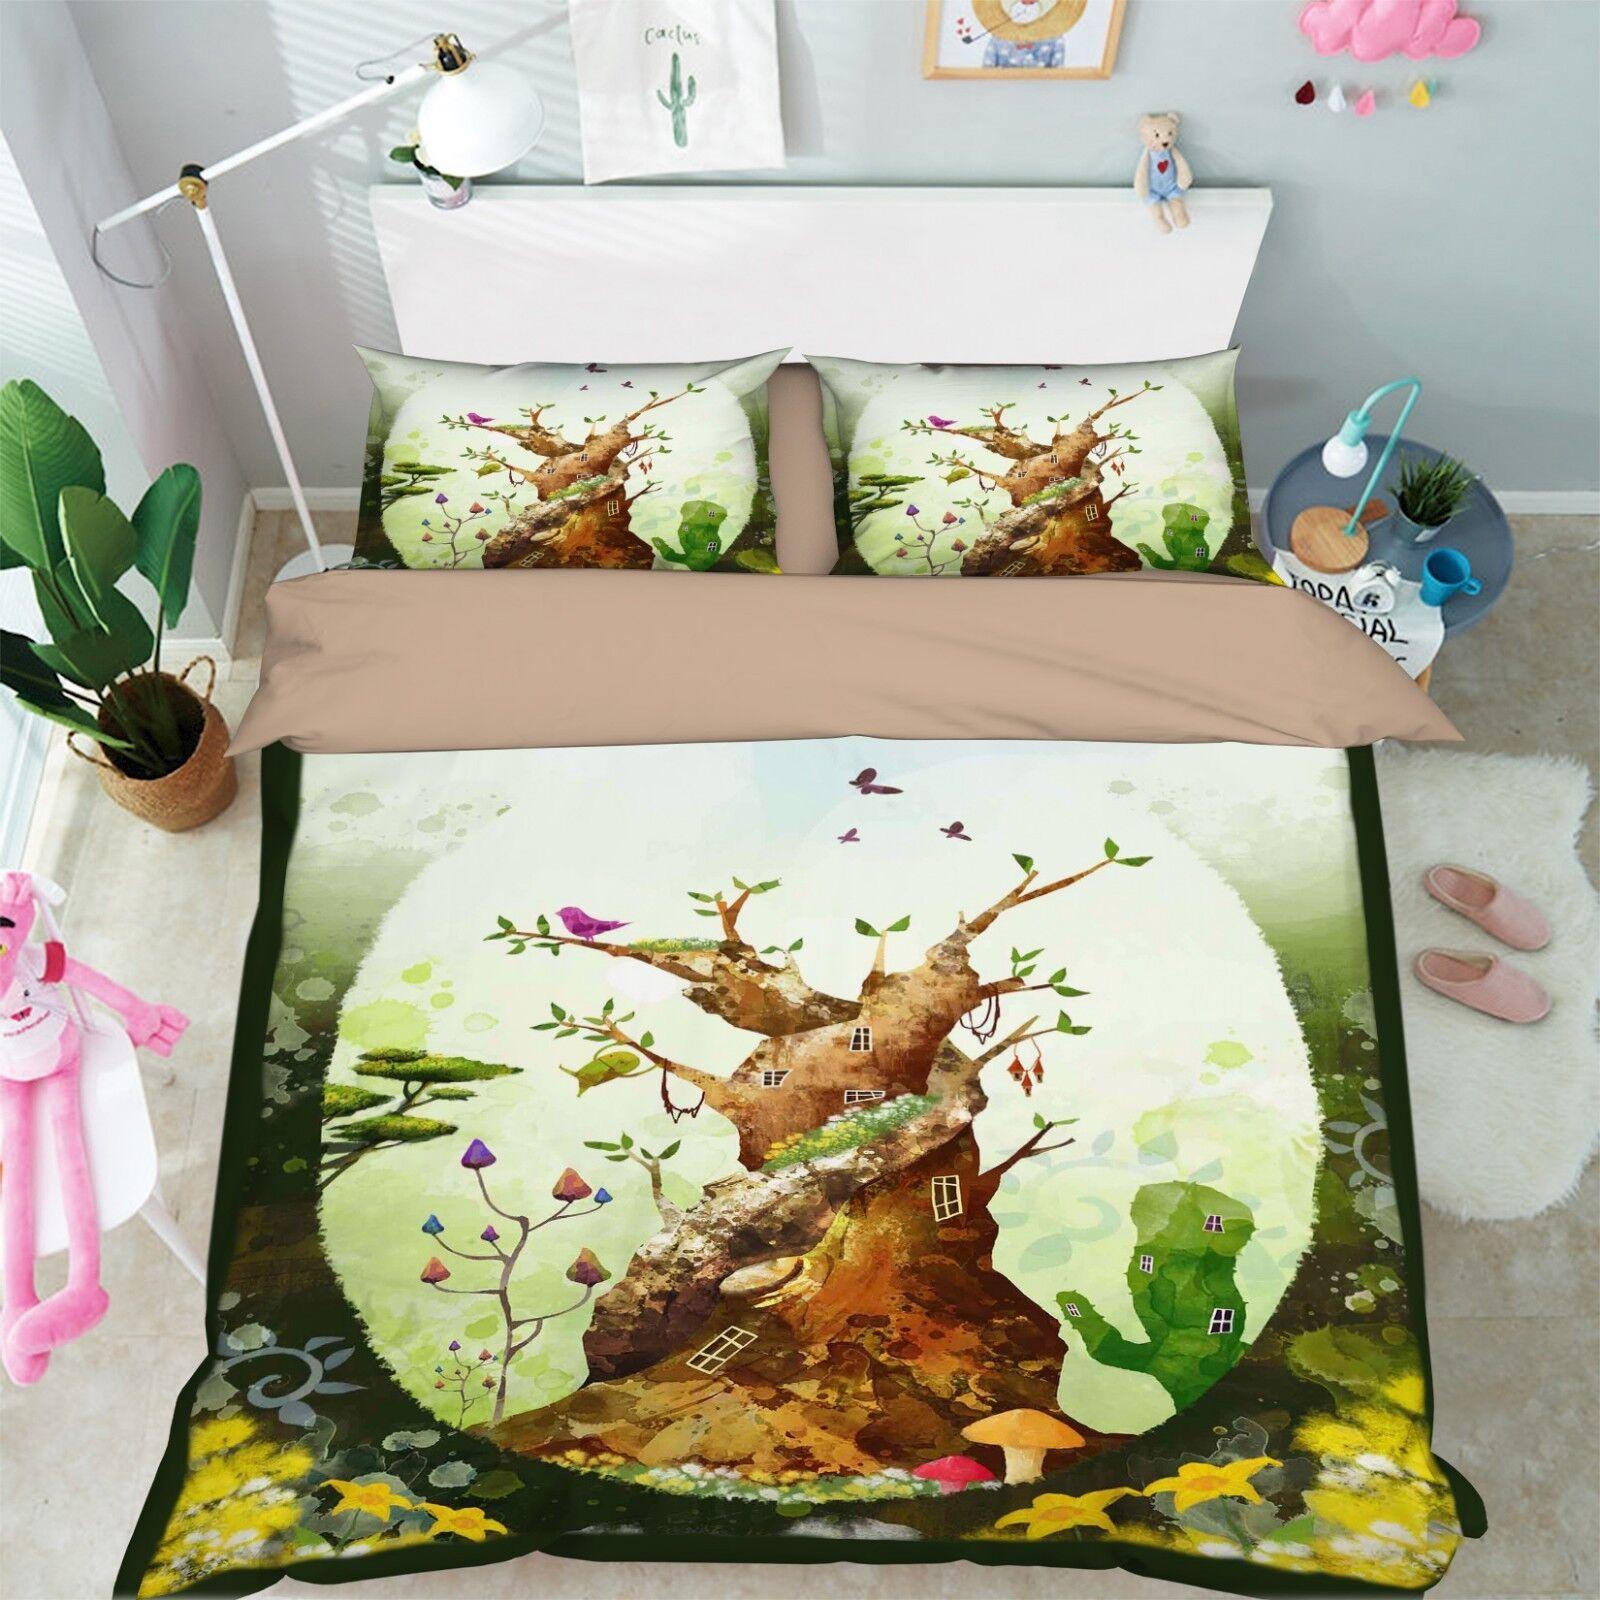 3D Painted Tree 578 Bed Pillowcases Quilt Duvet Cover Set Single King UK Summer